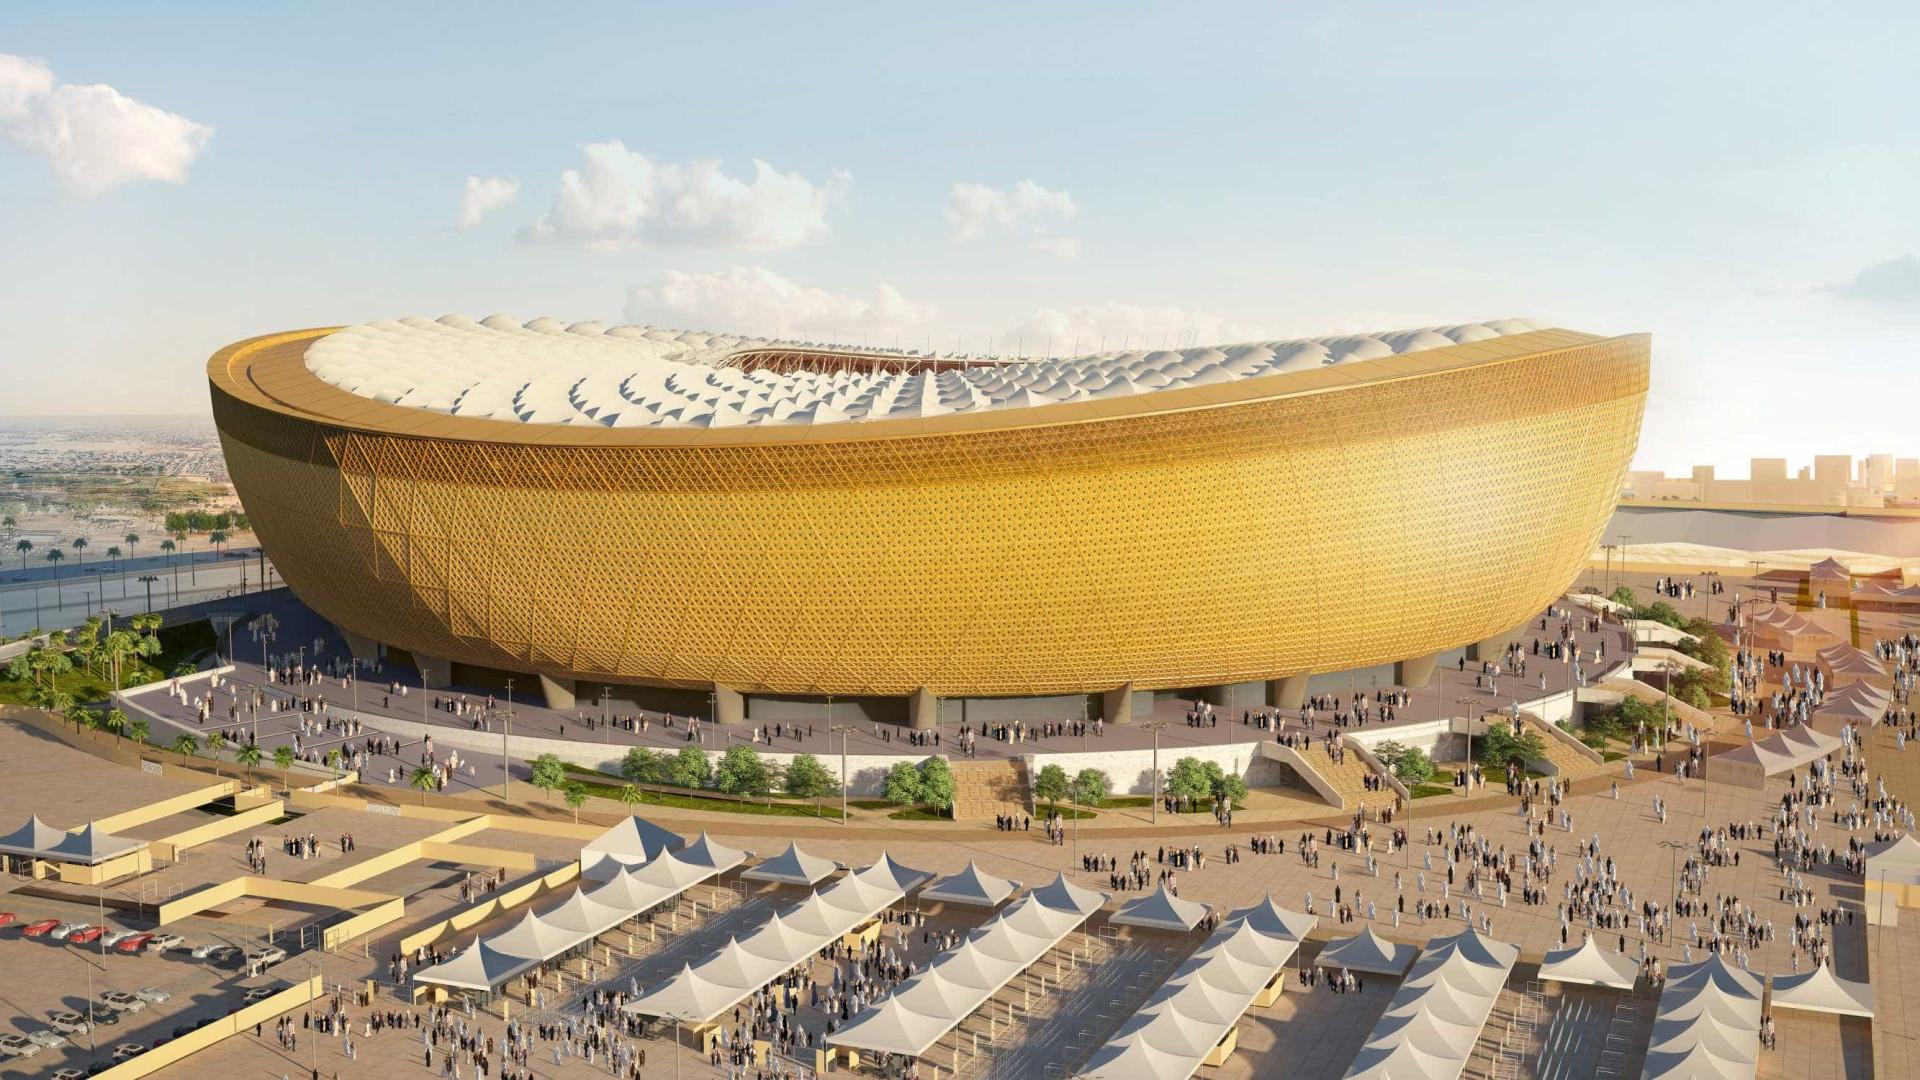 Fifa define o Catar como sede do Mundial de Clubes nos próximos anos